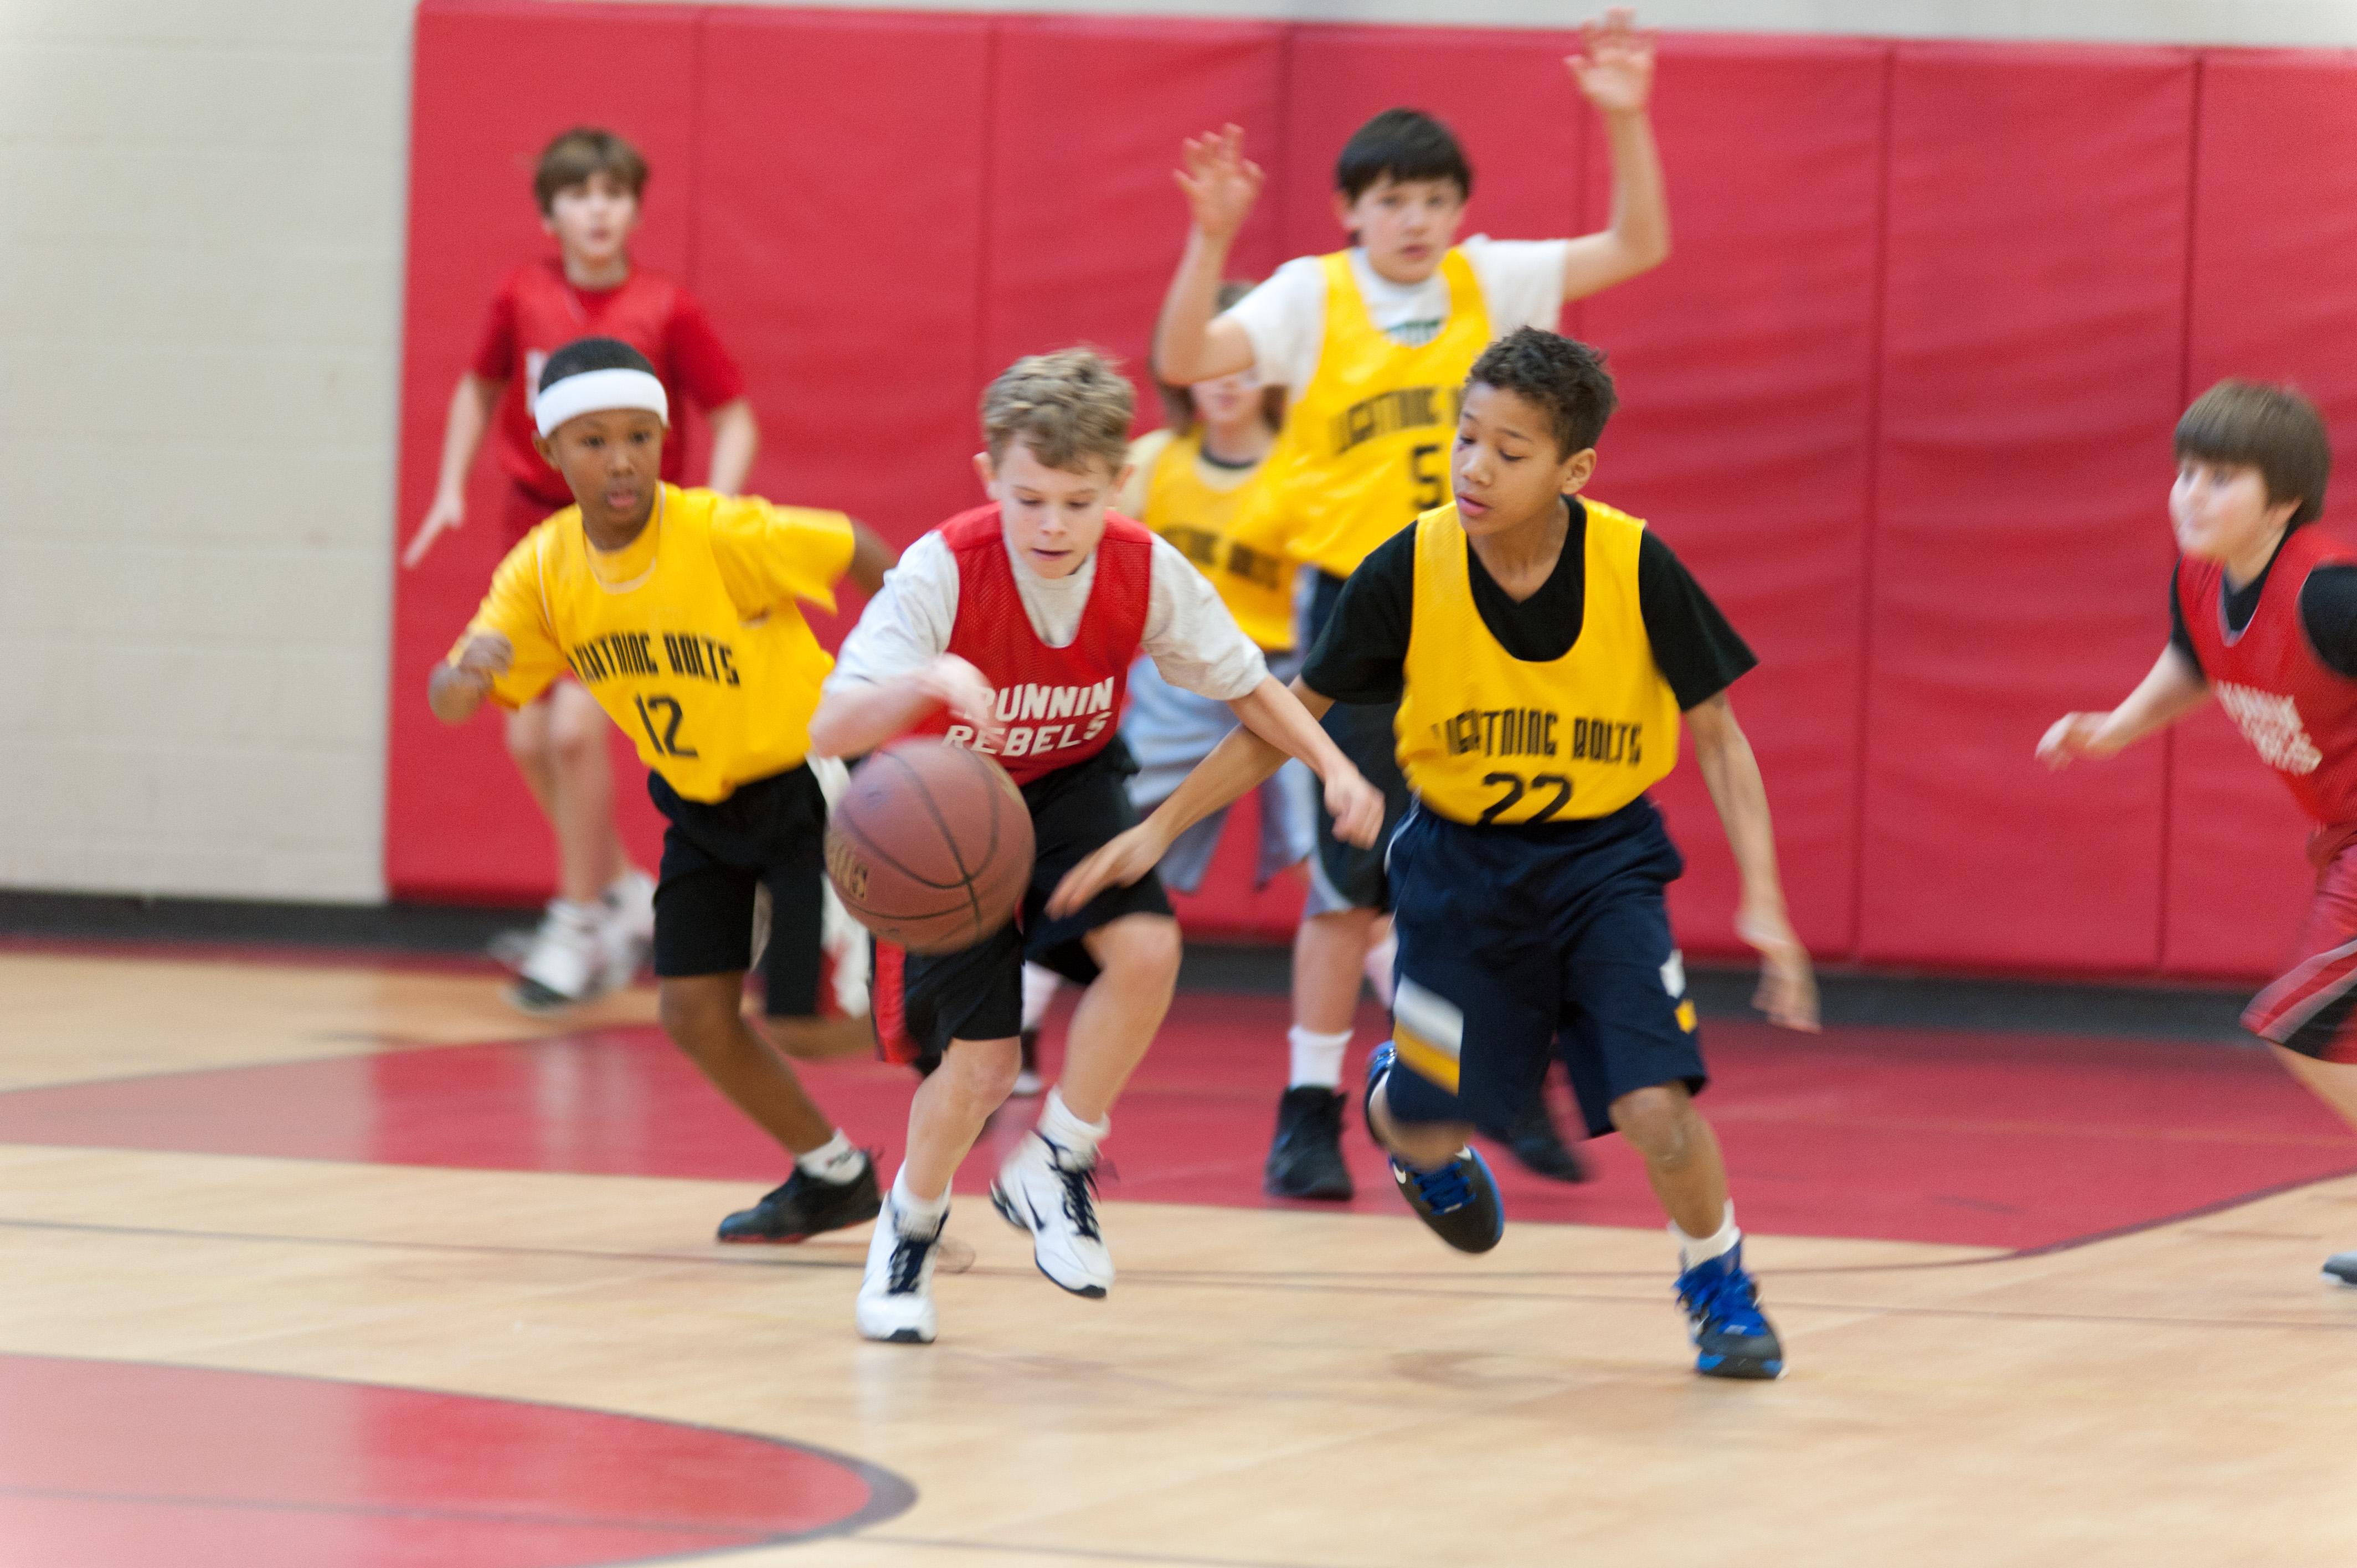 Basketball league photo